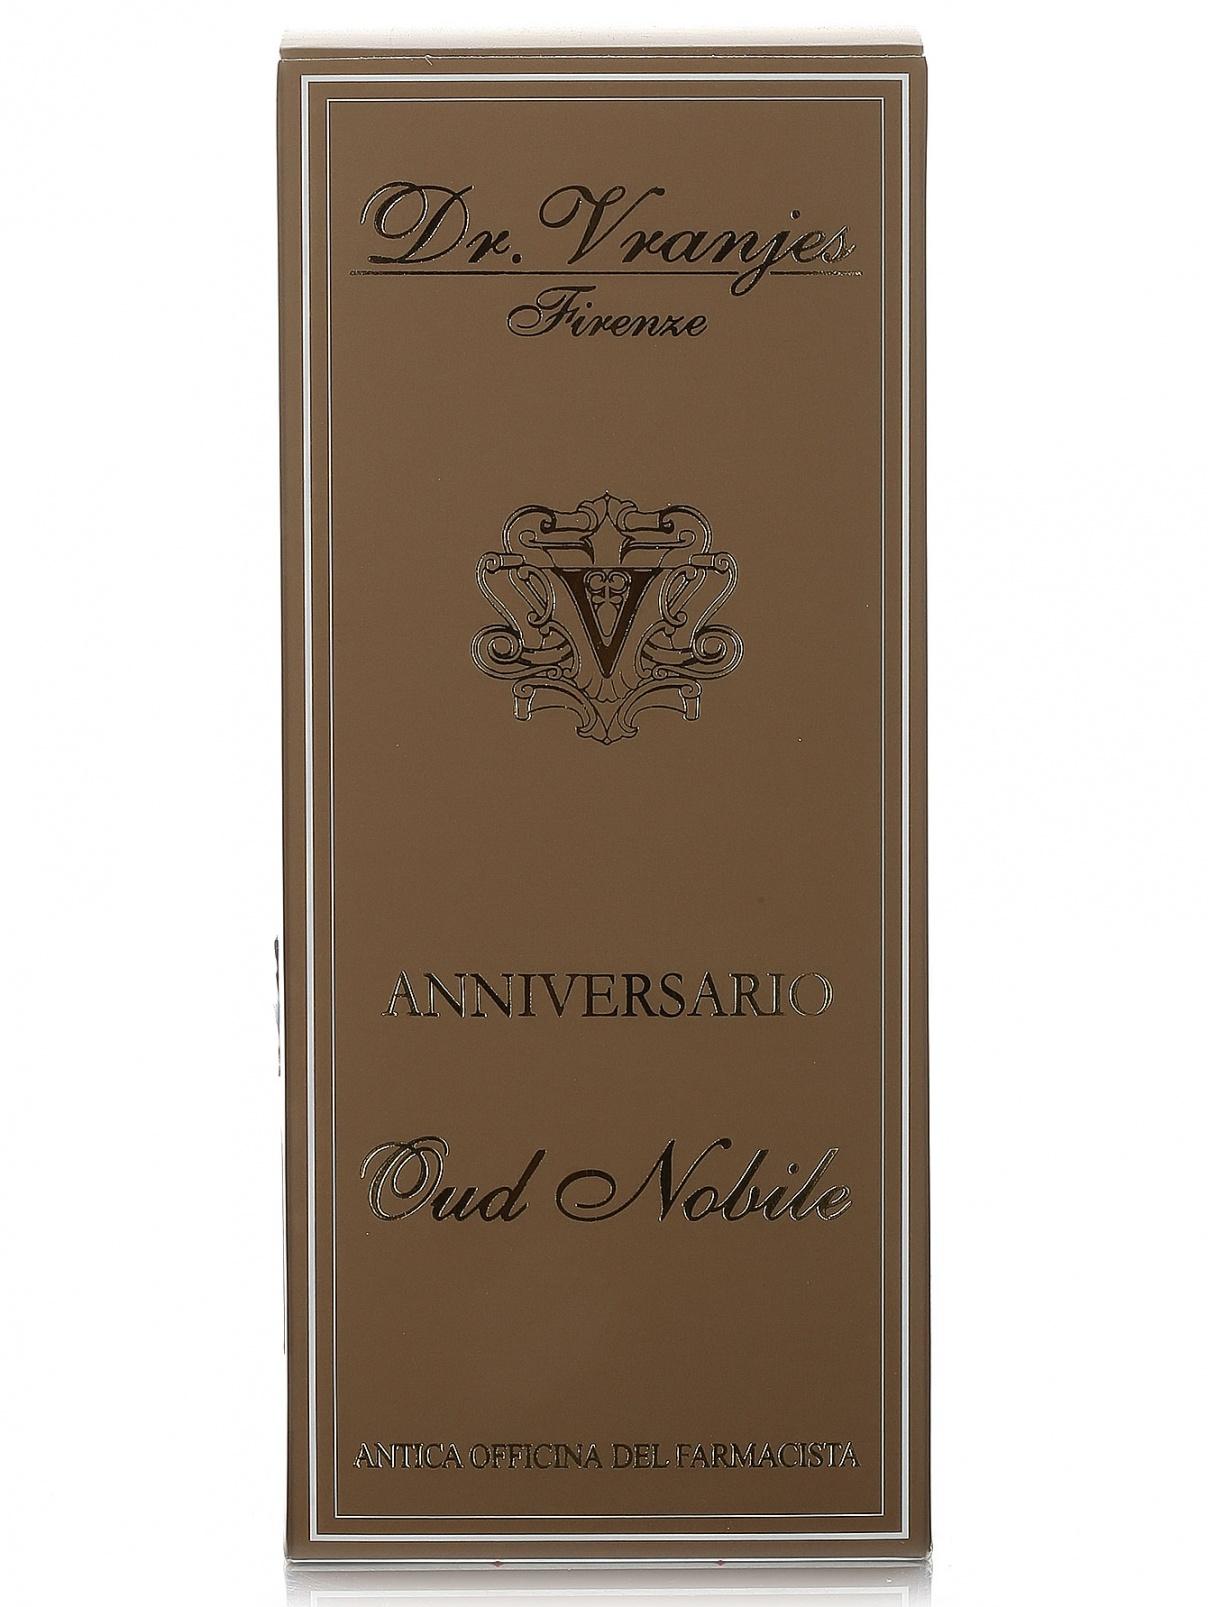 Ароматизатор воздуха Oud Nobile - Home Fragrance, 250ml Dr. Vranjes  –  Модель Общий вид